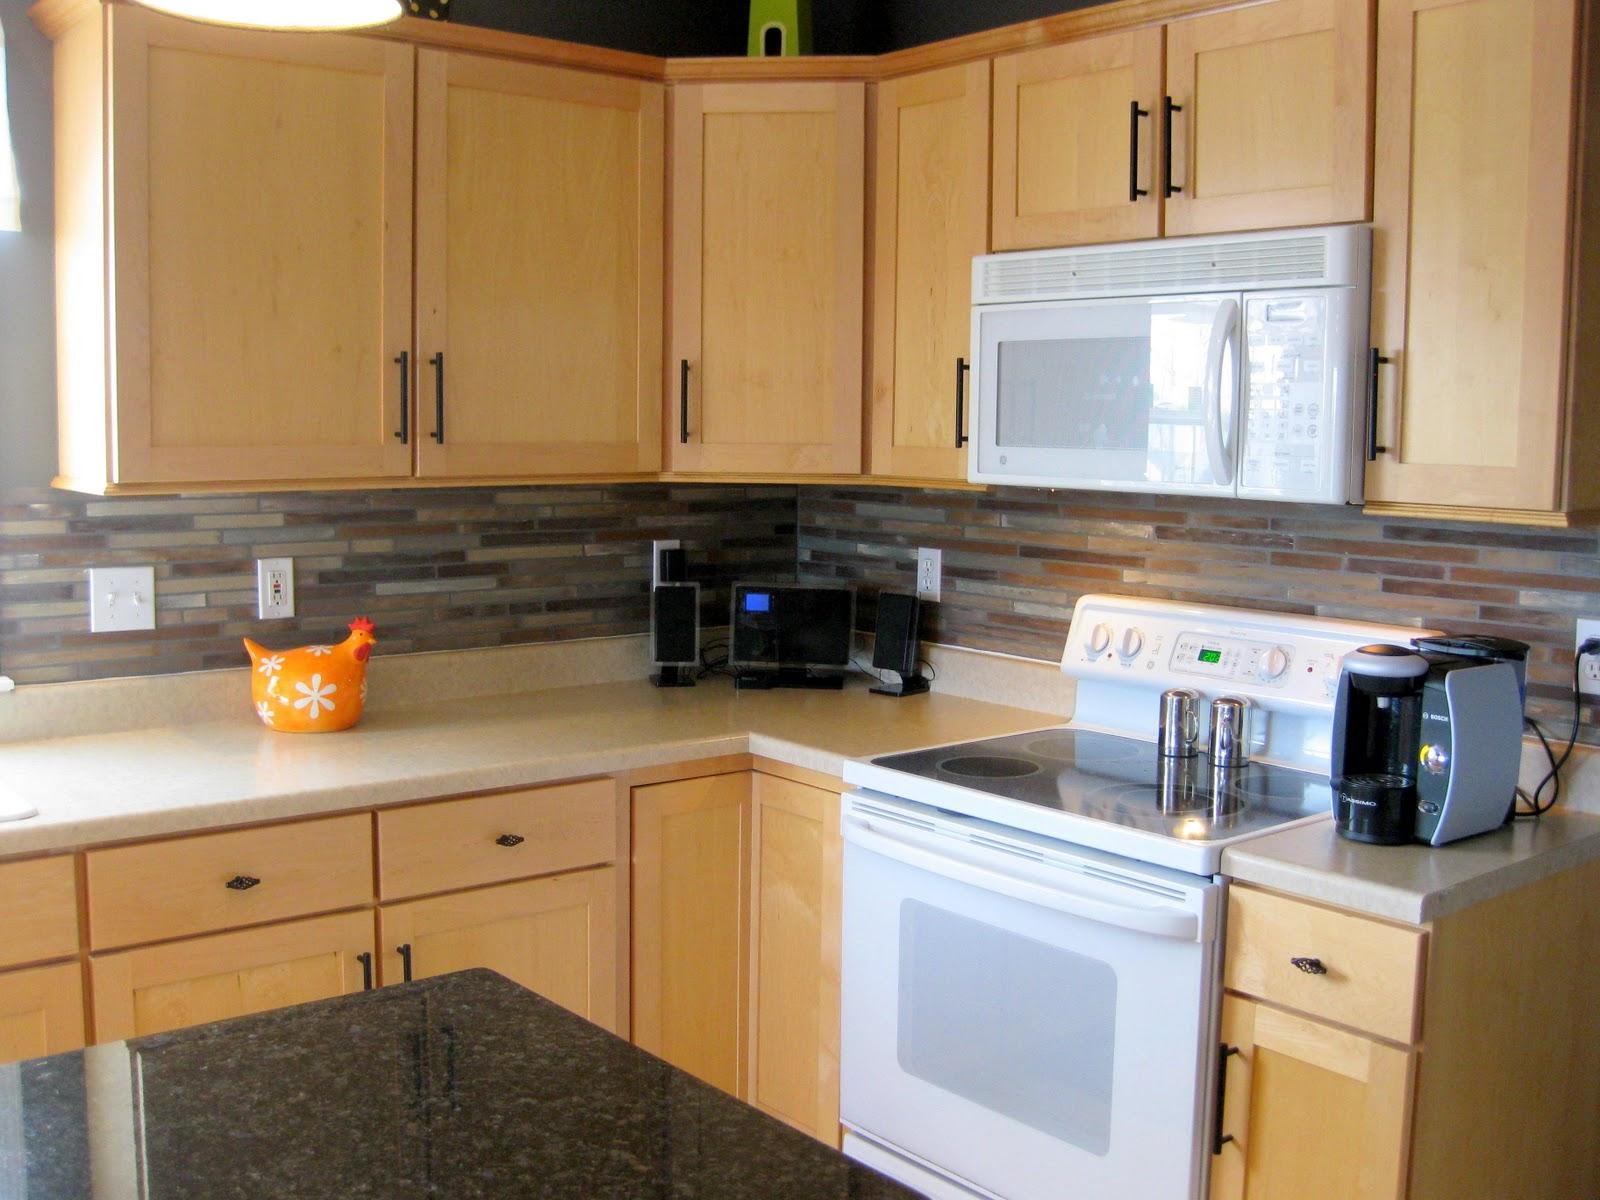 Painting Kitchen Tiles: S/E Backsplash